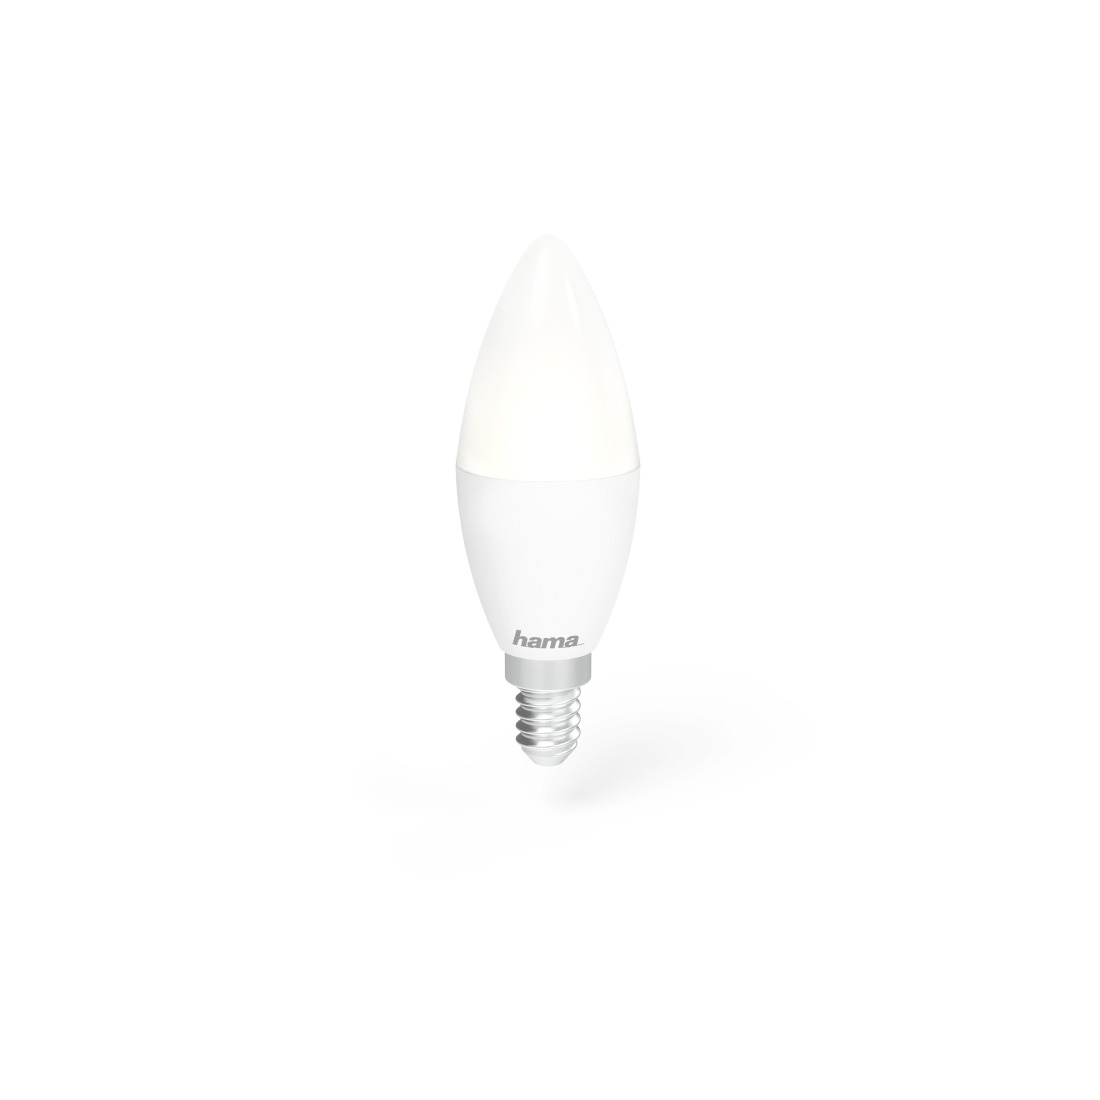 Hama Wifi-ledlamp, E14, 4,5W, , dimbaar Smartverlichting Wit